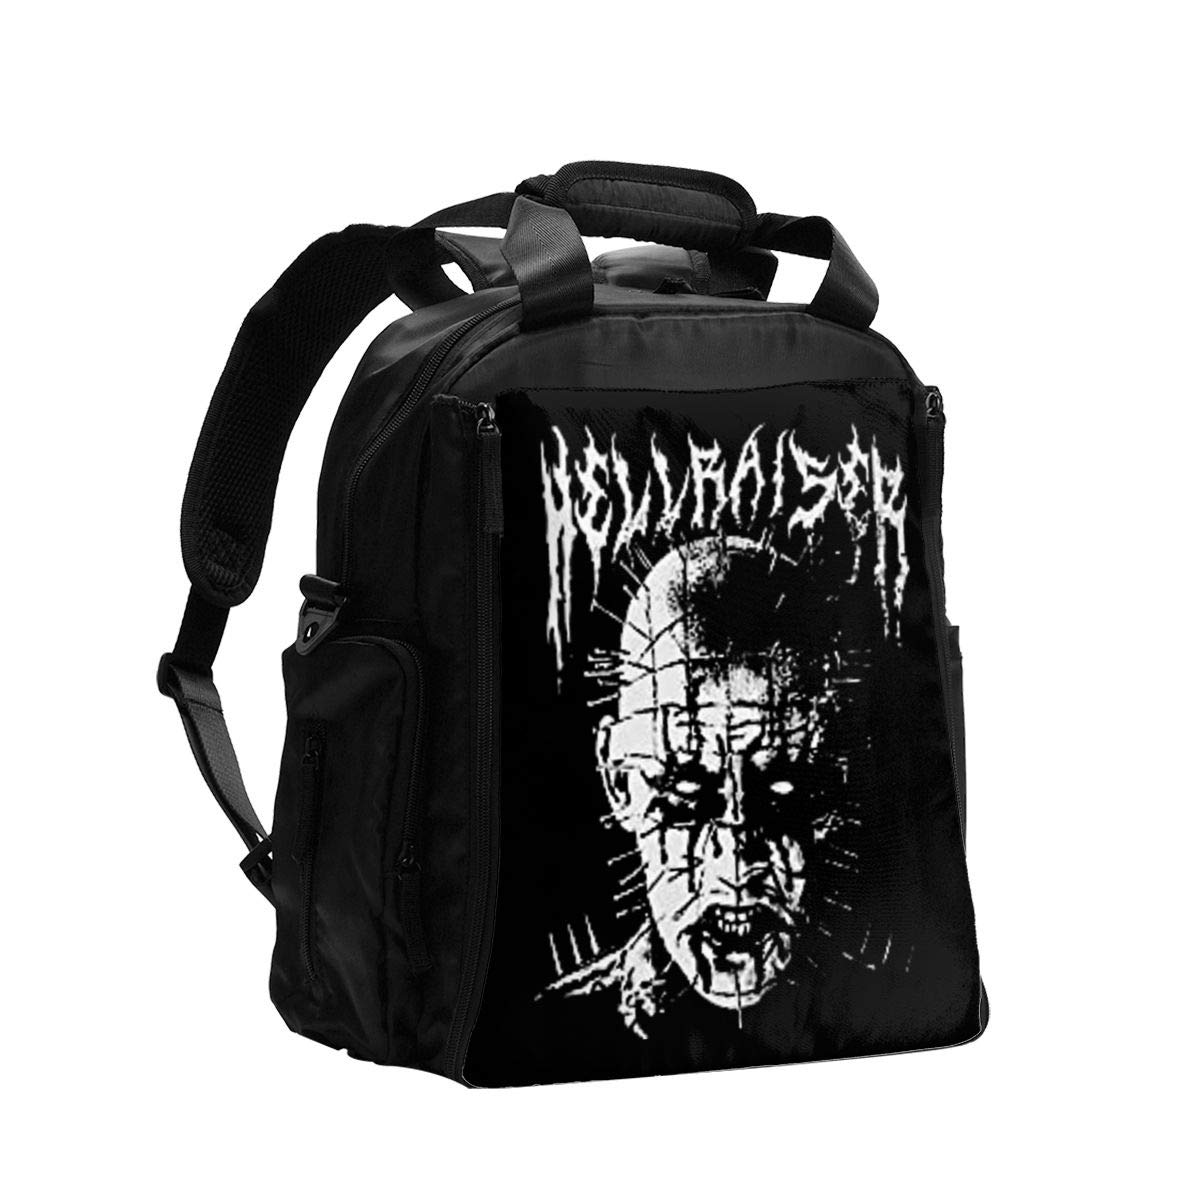 Lengyuye E Hellraiser Free Standing Urine Pad Diaper Bag Backpack